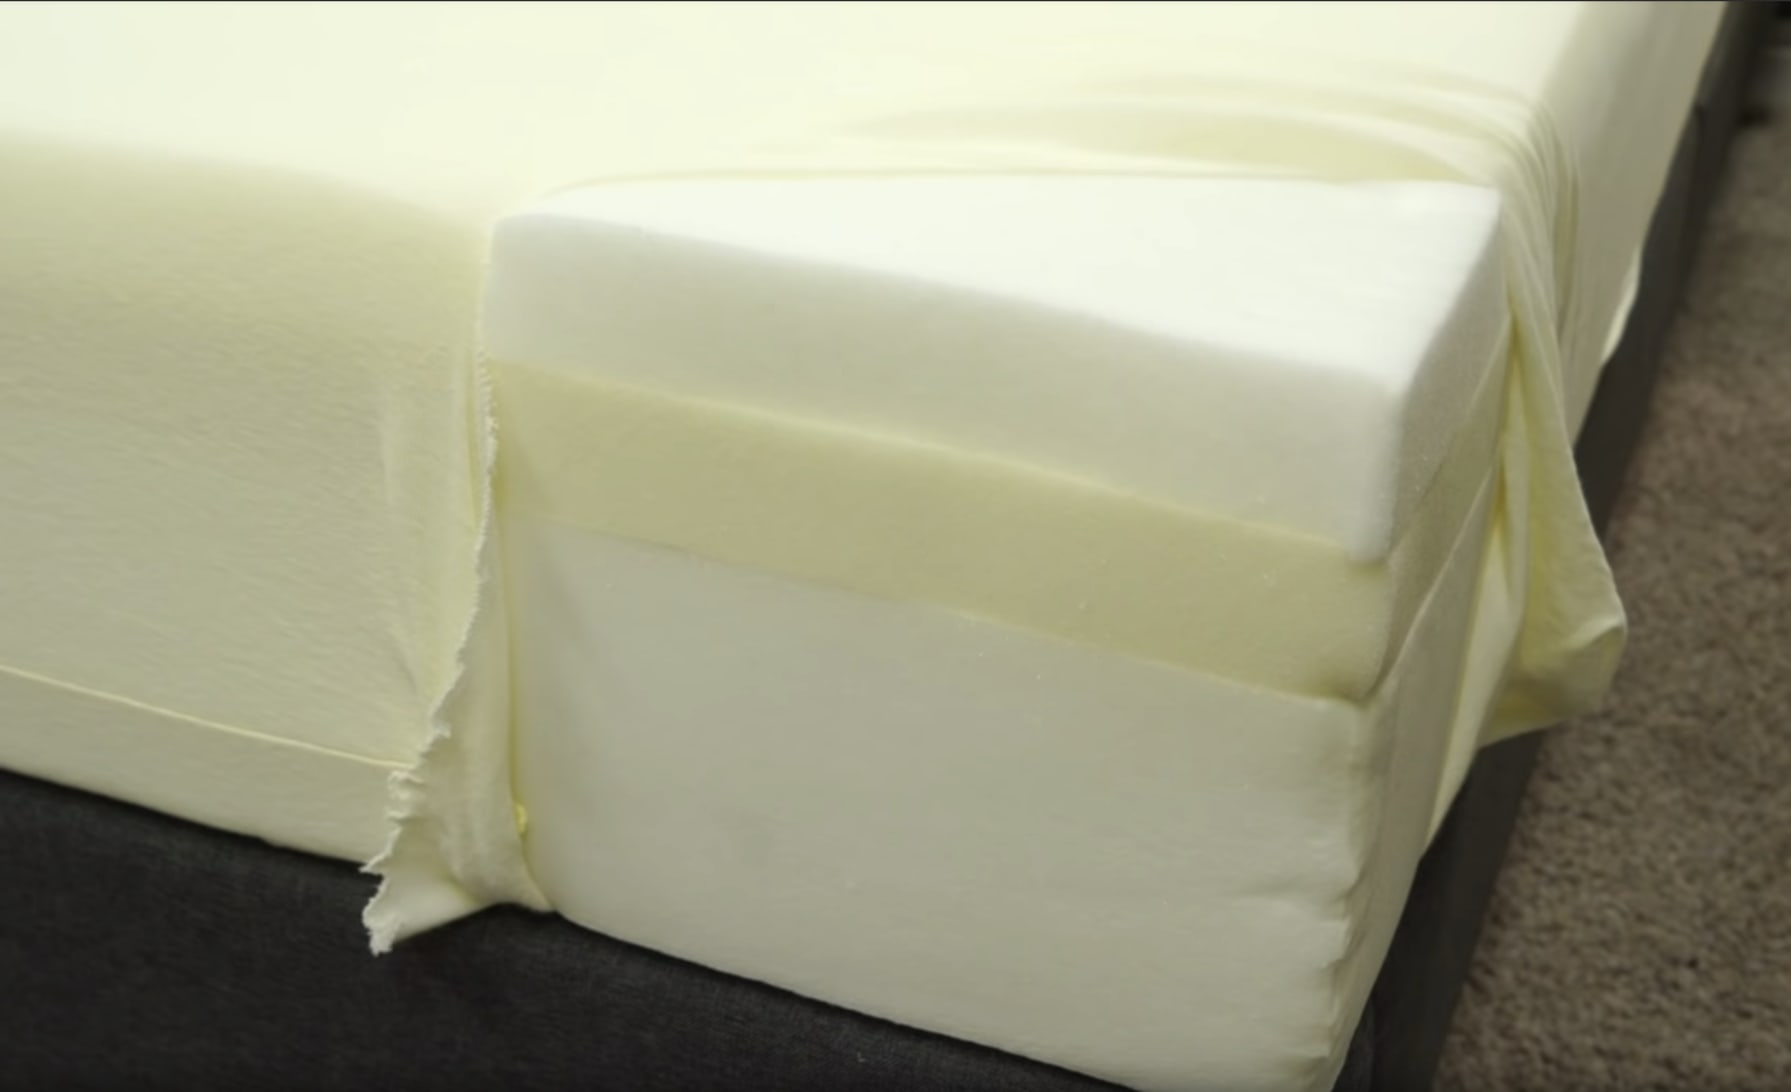 Leesa Mattress Foam Layers